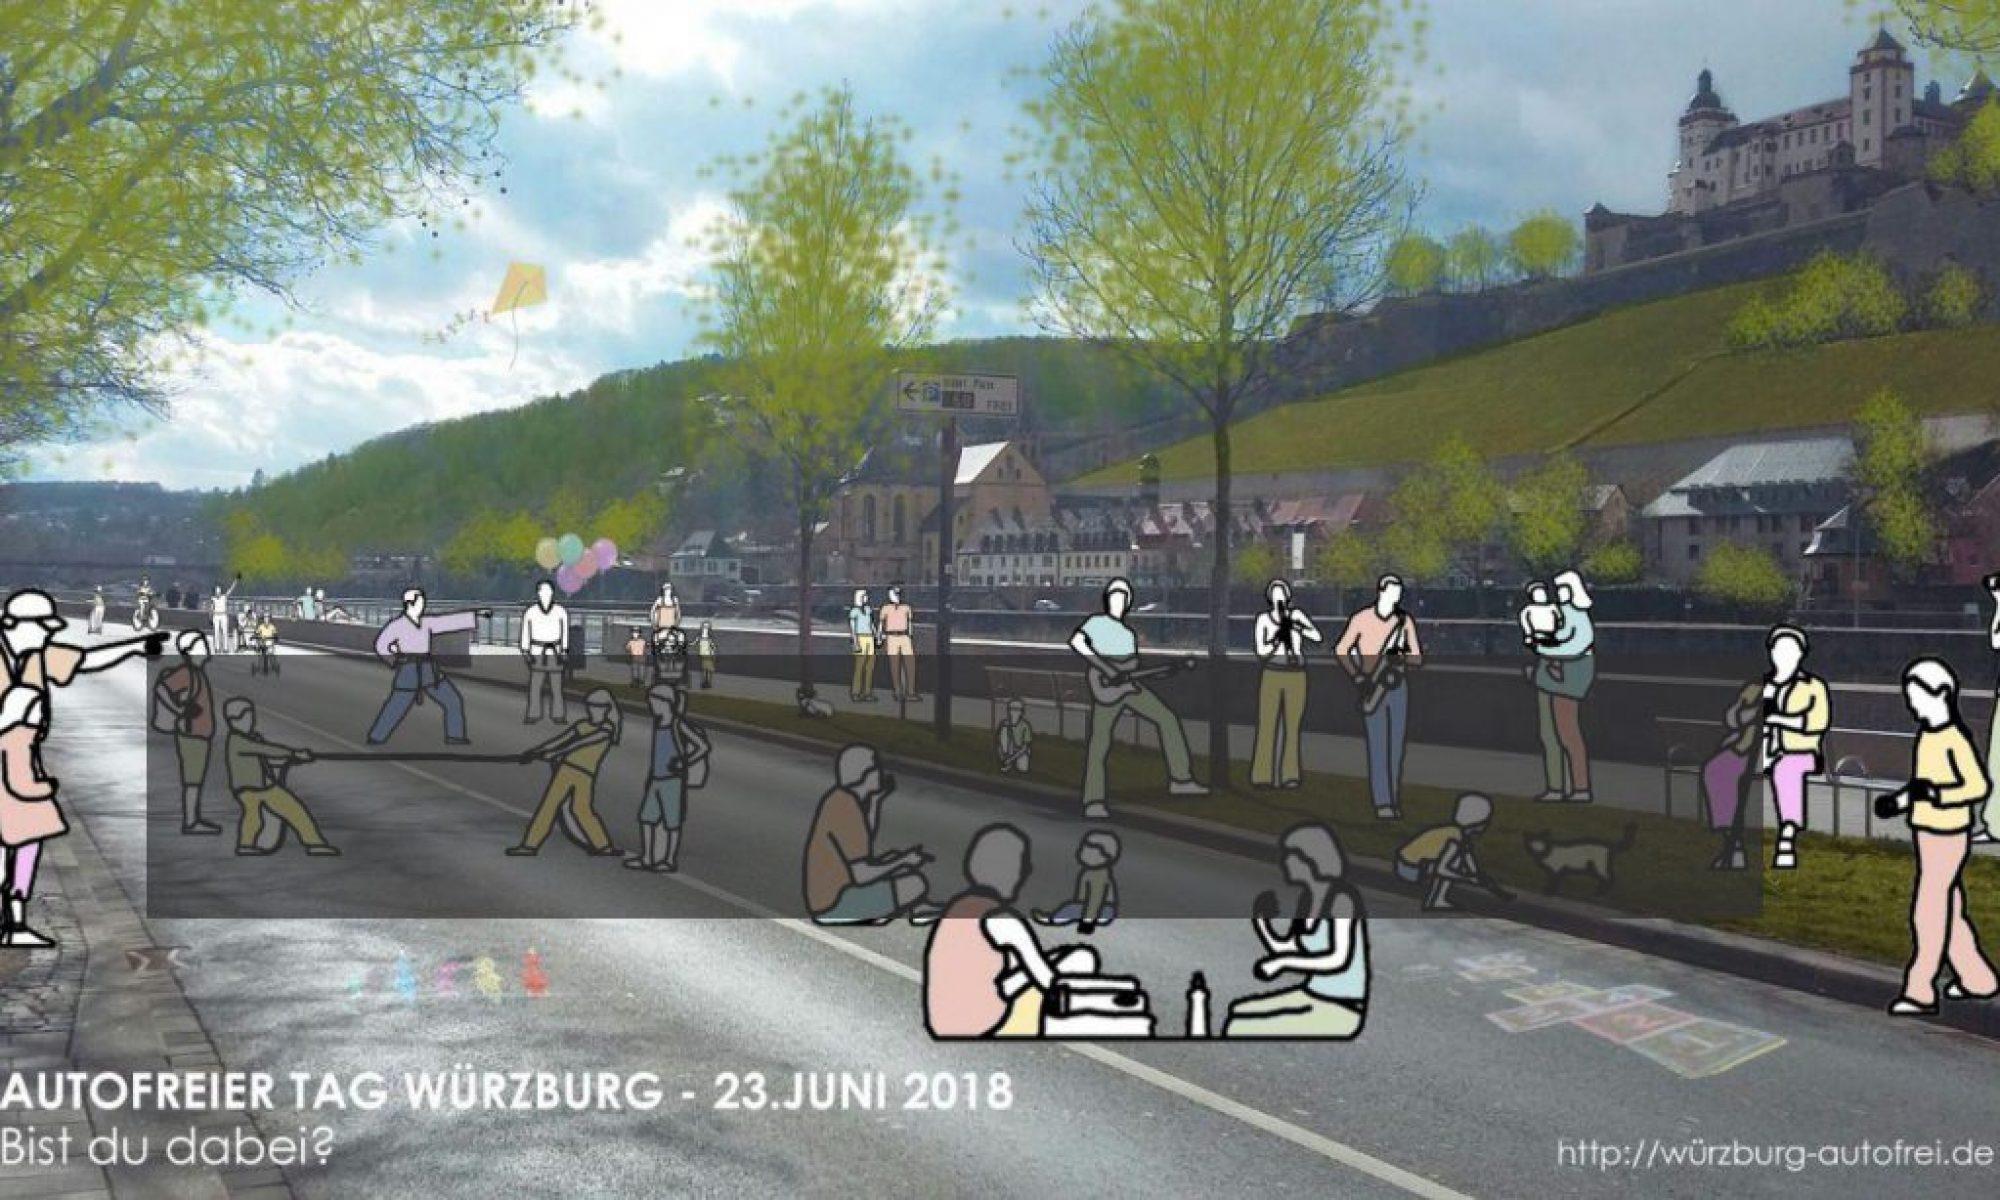 Autofreier Tag Würzburg  -  21.9.2019